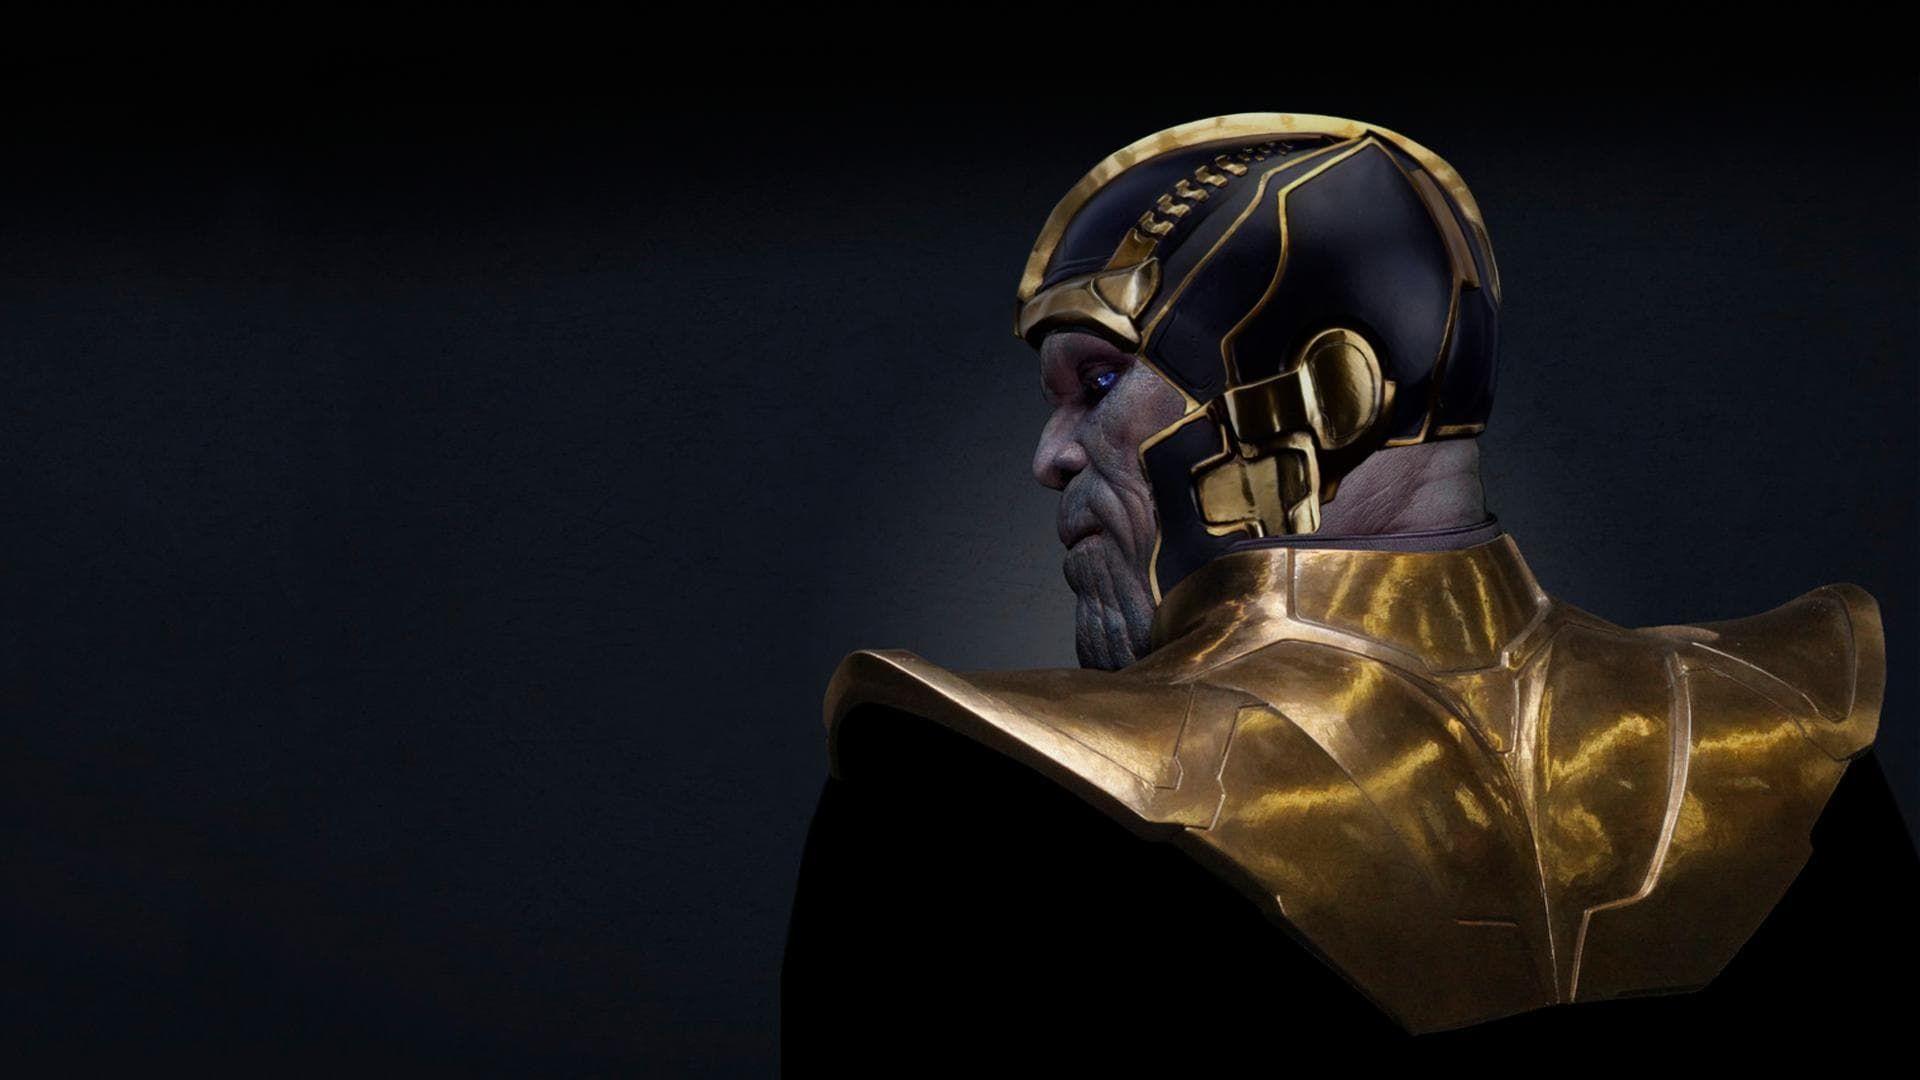 Avengers Infinity War 2018 Ganzer Film Deutsch Komplett Kino Avengers Infinity War 2018complete Film Deutsch Avengers Ganze Filme Infinity War Avengers